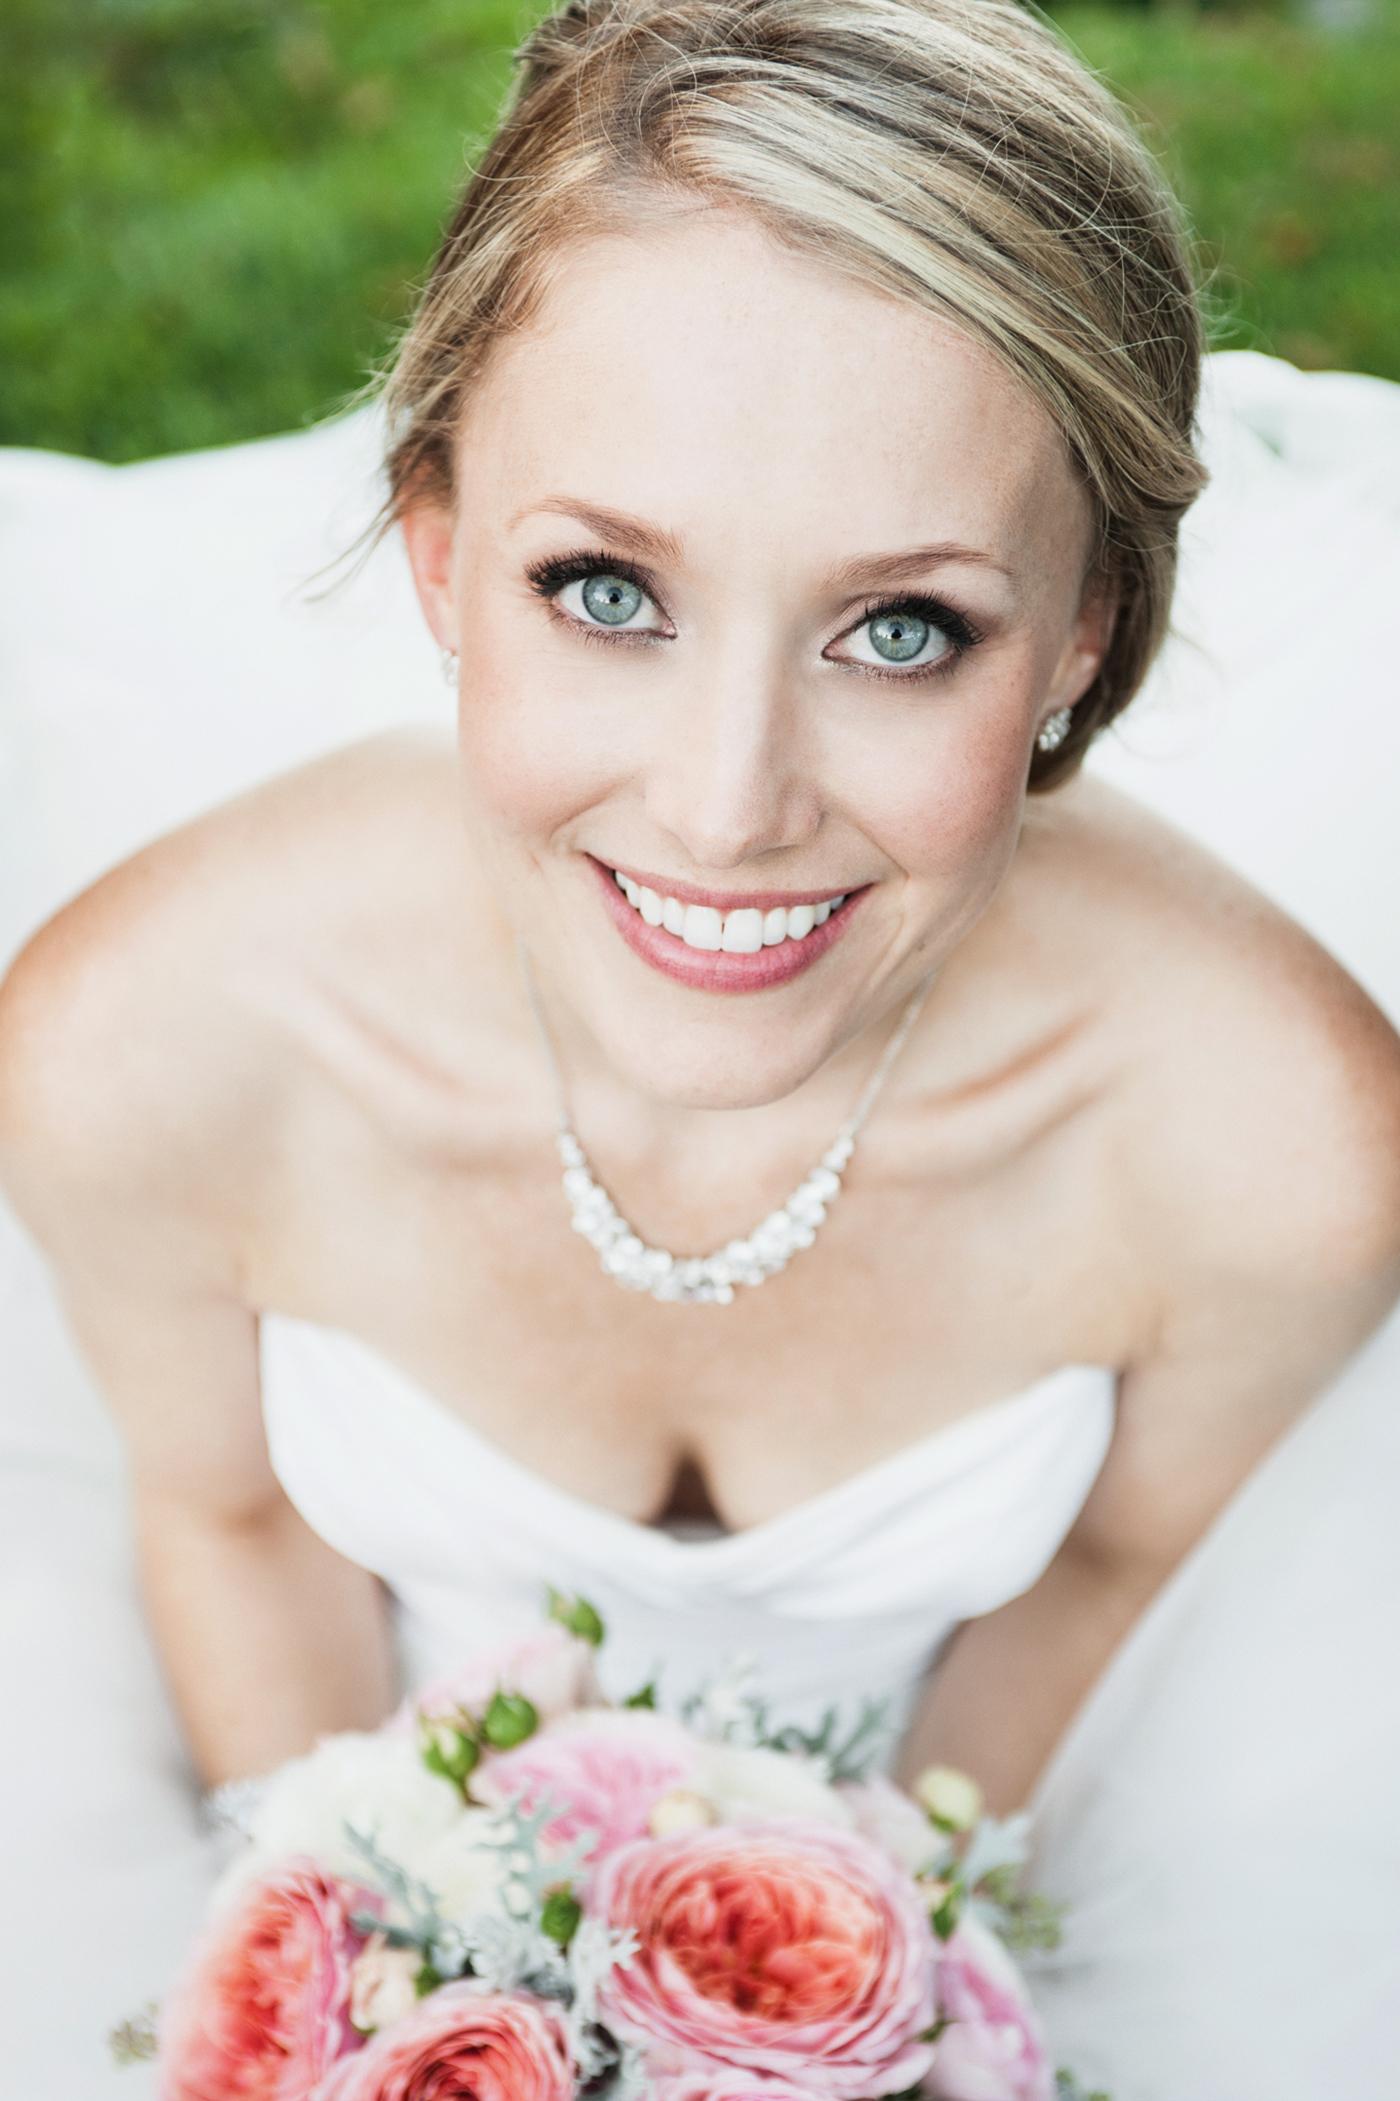 Featured Wedding: Kristen + Jordan's Marin County Waterside Wedding // The Overwhelmed Bride Wedding Blog + Southern California Wedding Planner